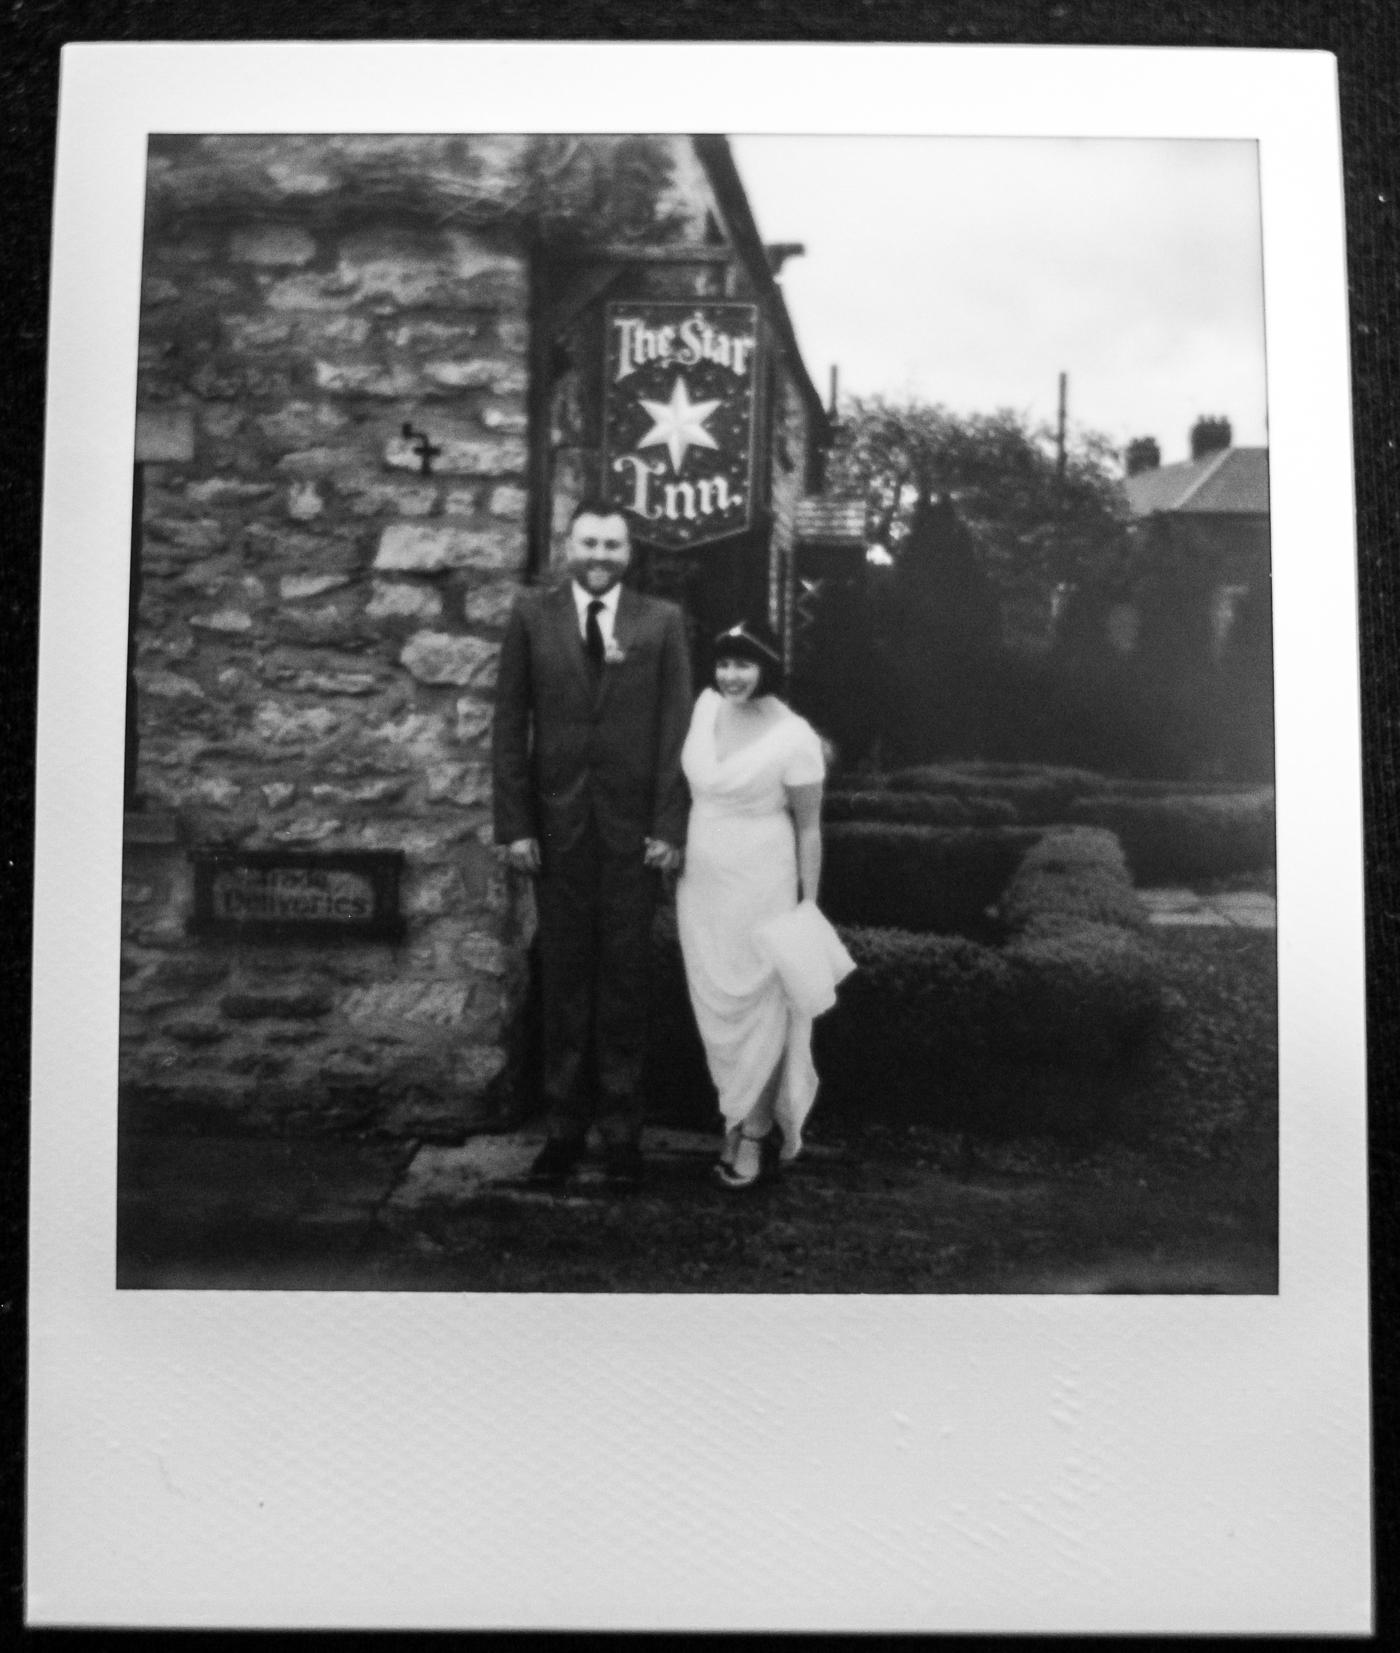 star-inn-harome-north-yorkshire-teesside-wedding-photography-0007.jpg